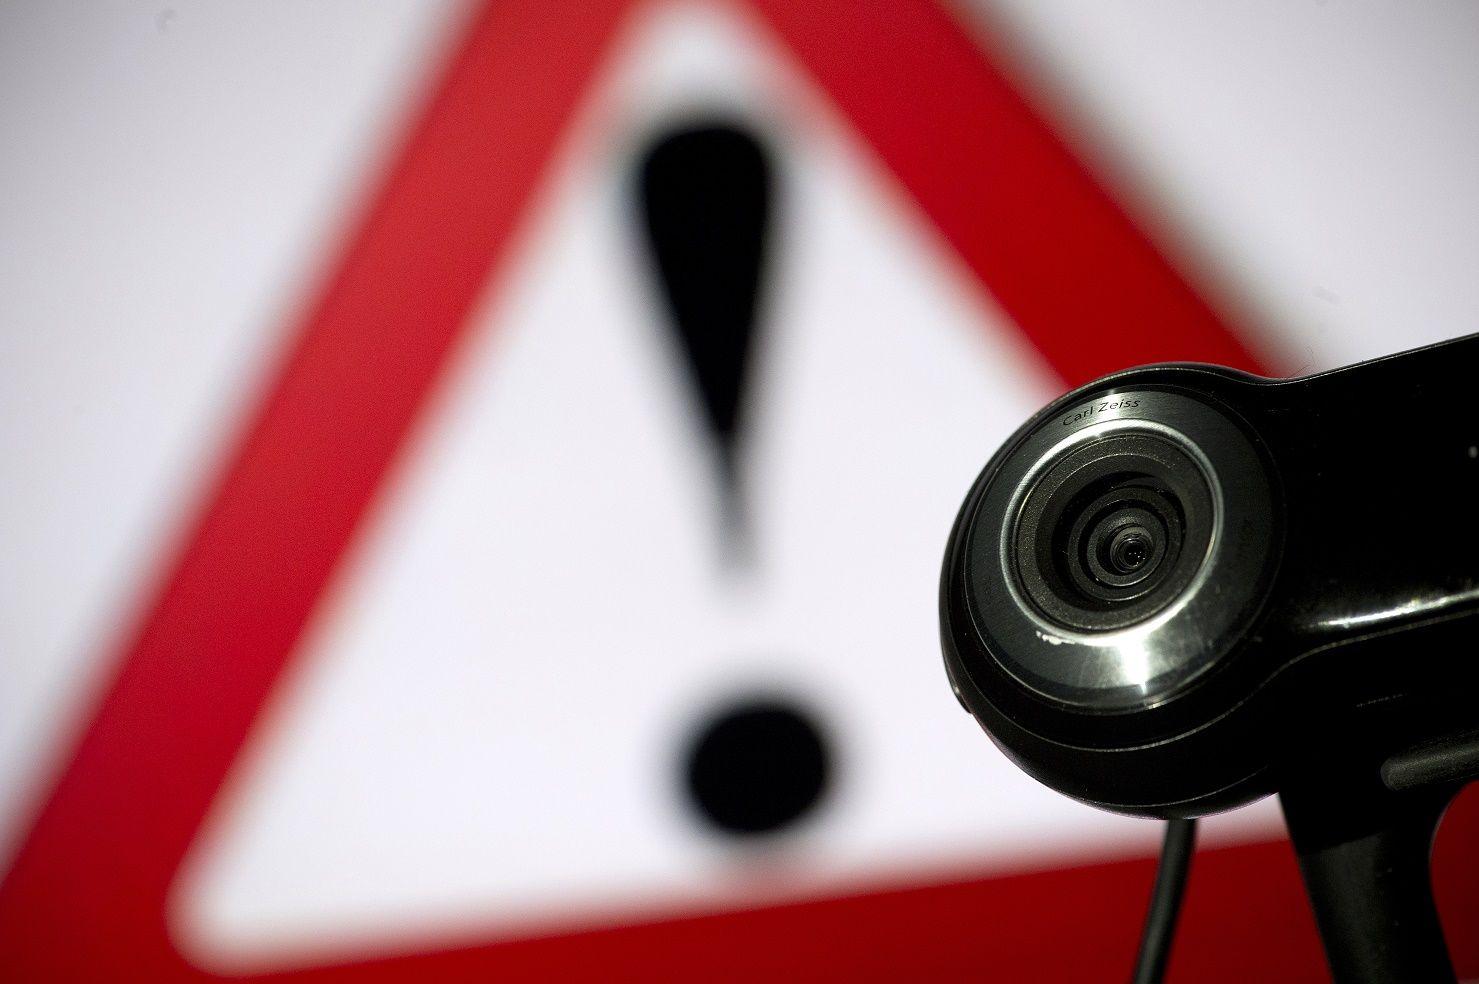 mirai botnet russia bank cyberattack